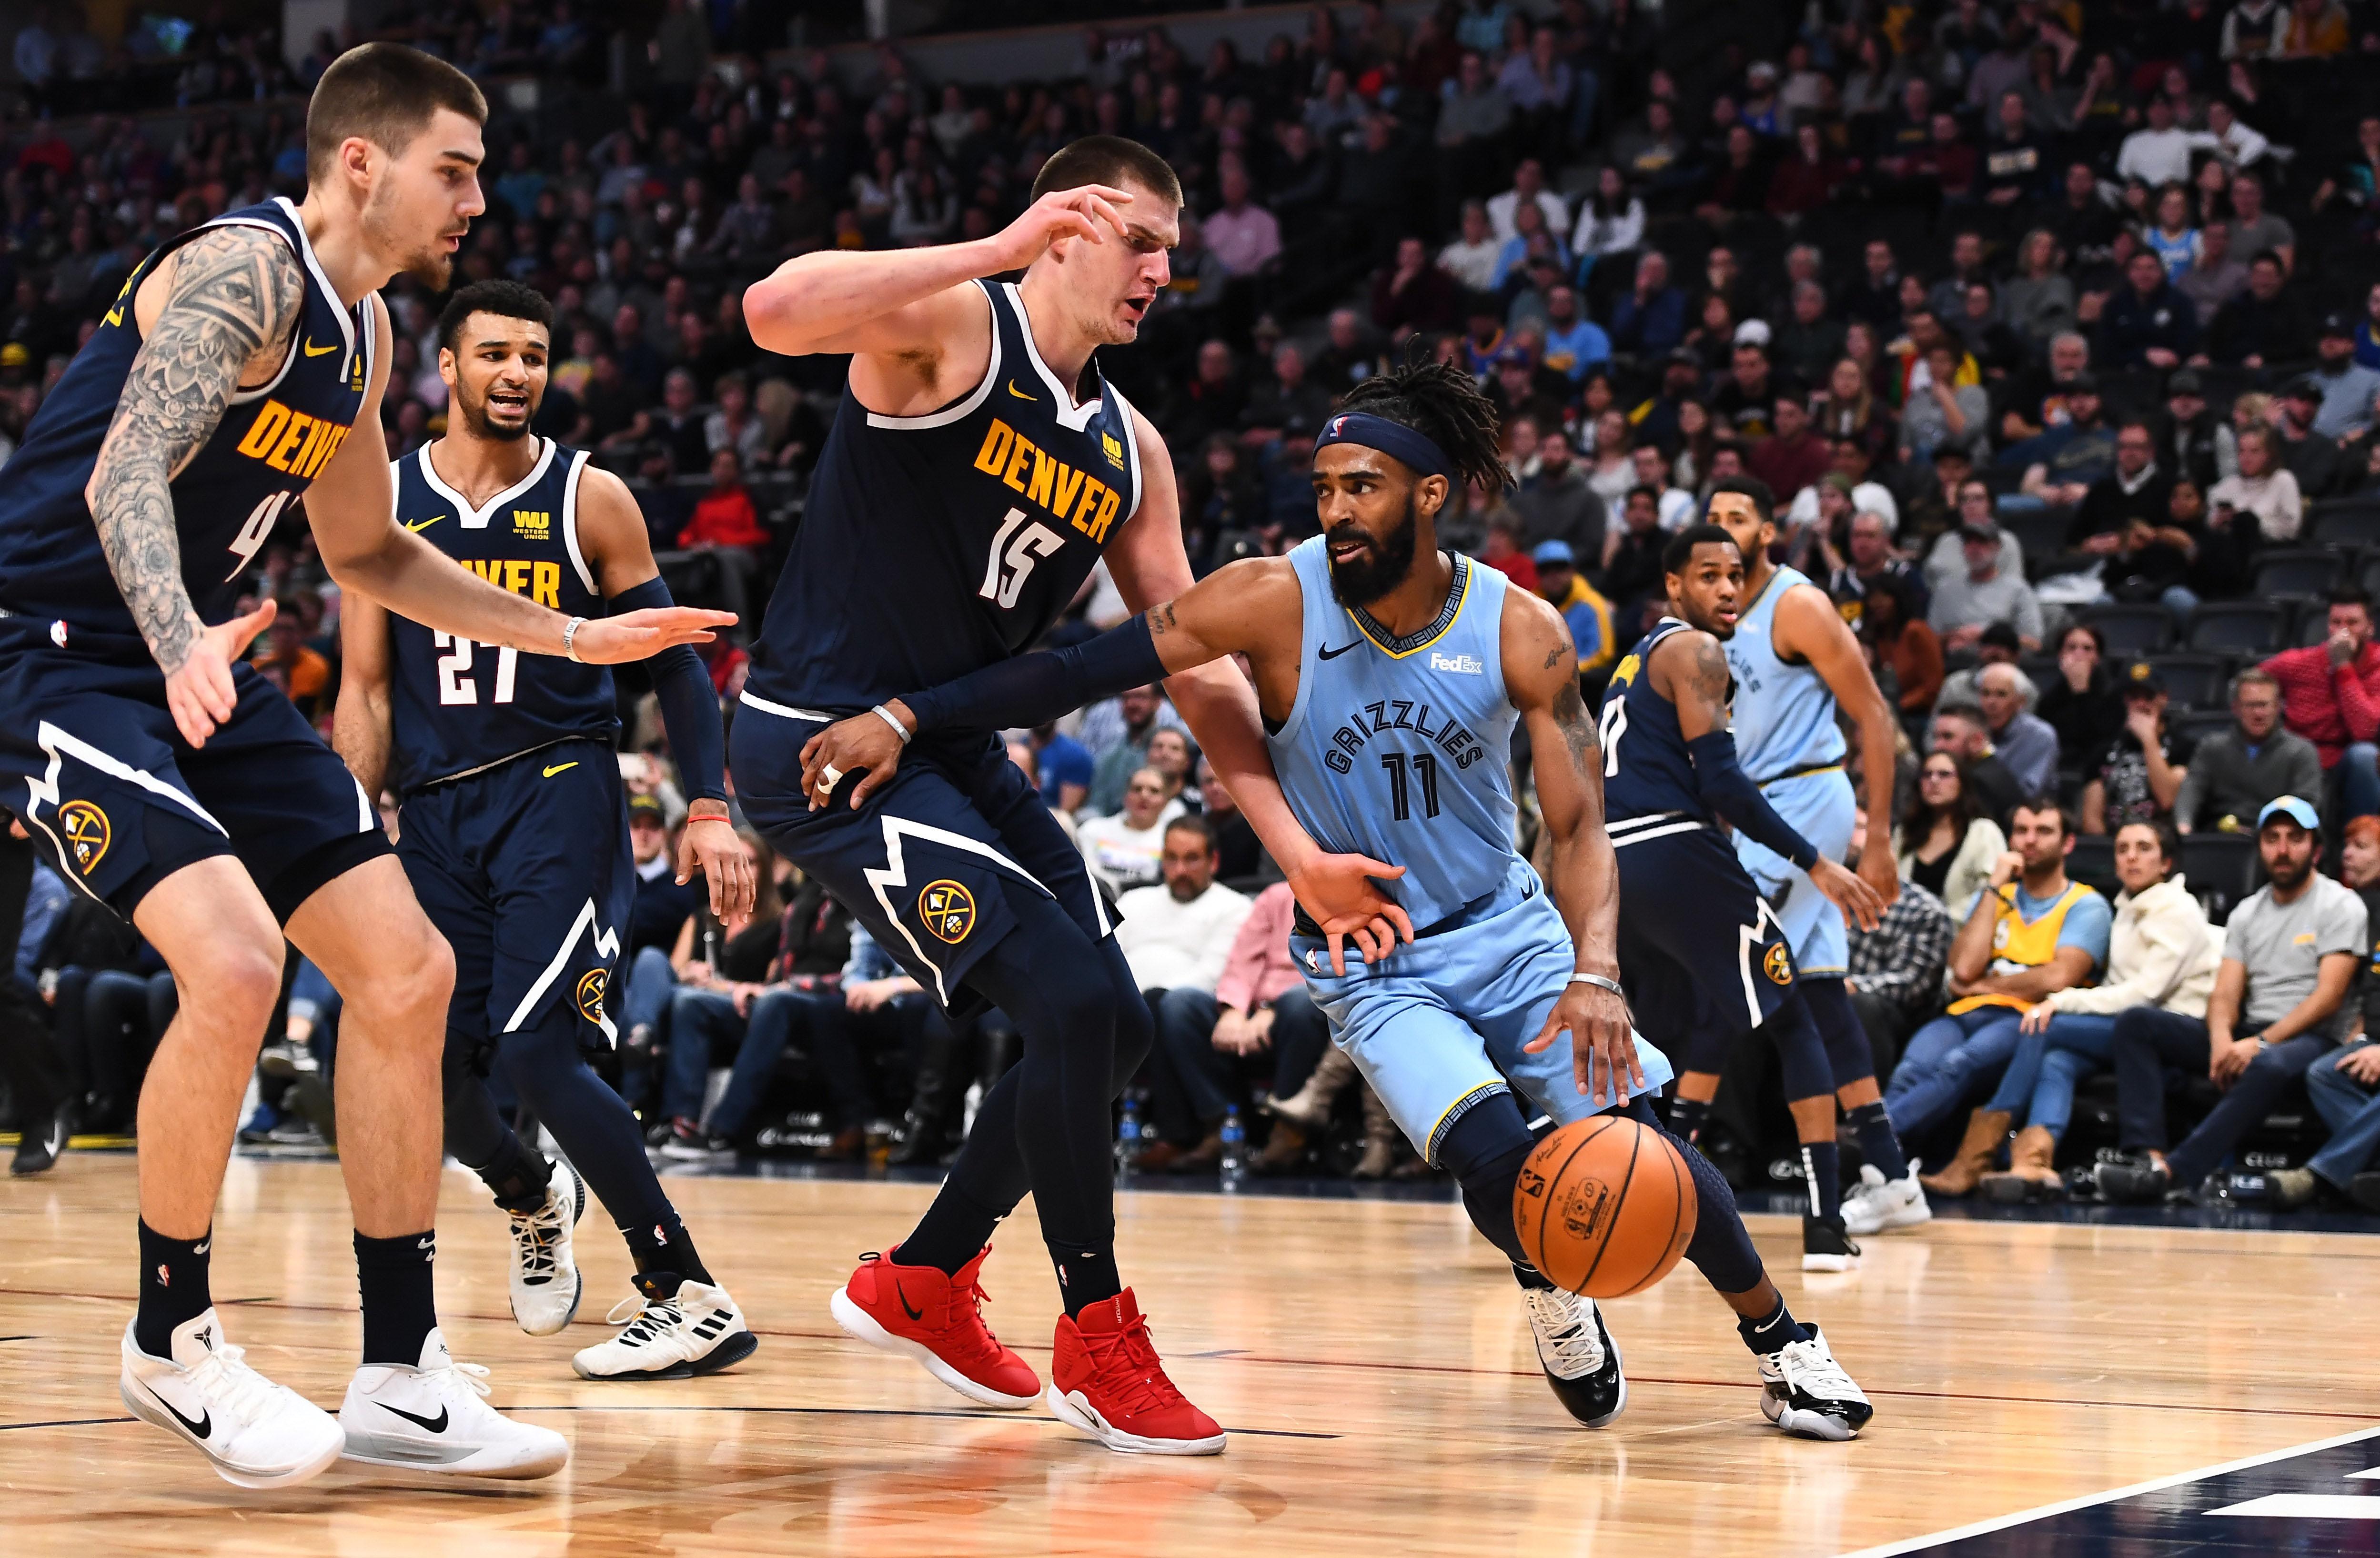 Memphis Grizzlies guard Mike Conley (11) drives at Denver Nuggets forward Juan Hernangomez (41) and center Nikola Jokic (15) in the second half at the Pepsi Center.